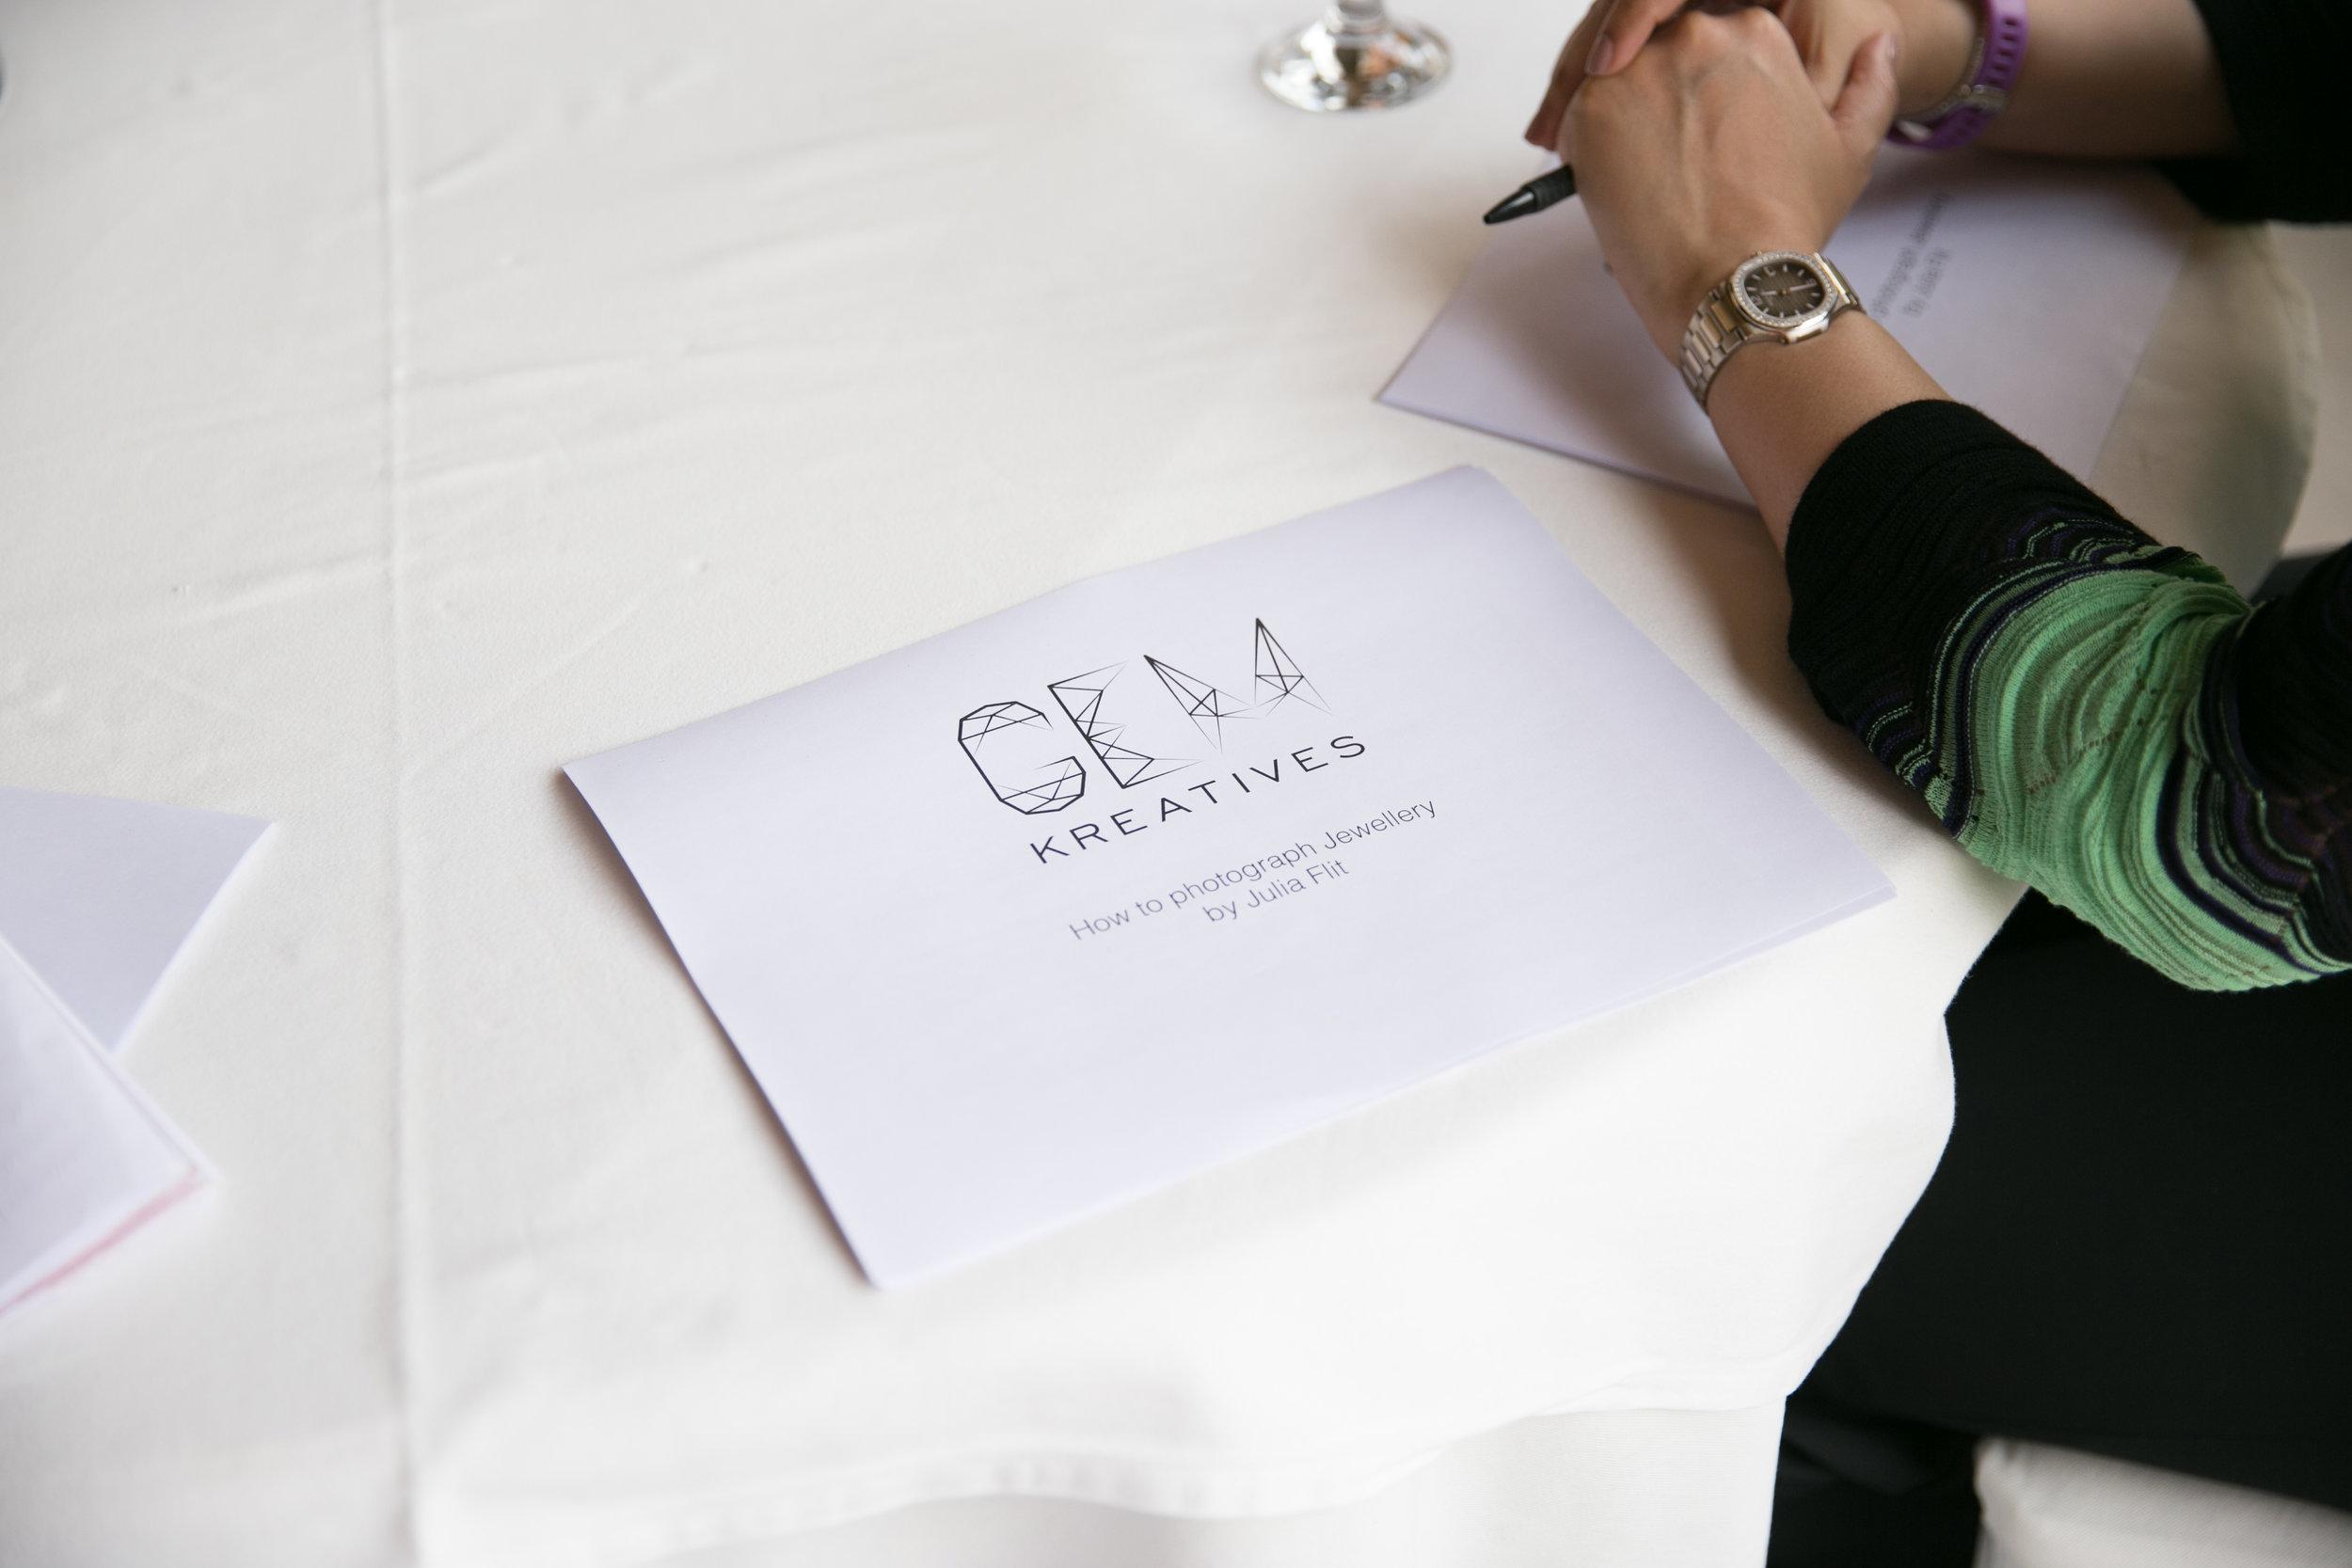 gem kreatives_seminar_creative agency_jewellery photographer_product shots london_jewellery brand development_jewellery agency_jewellery branding agency lodnon_jewelry photography_how to photograph jewellery